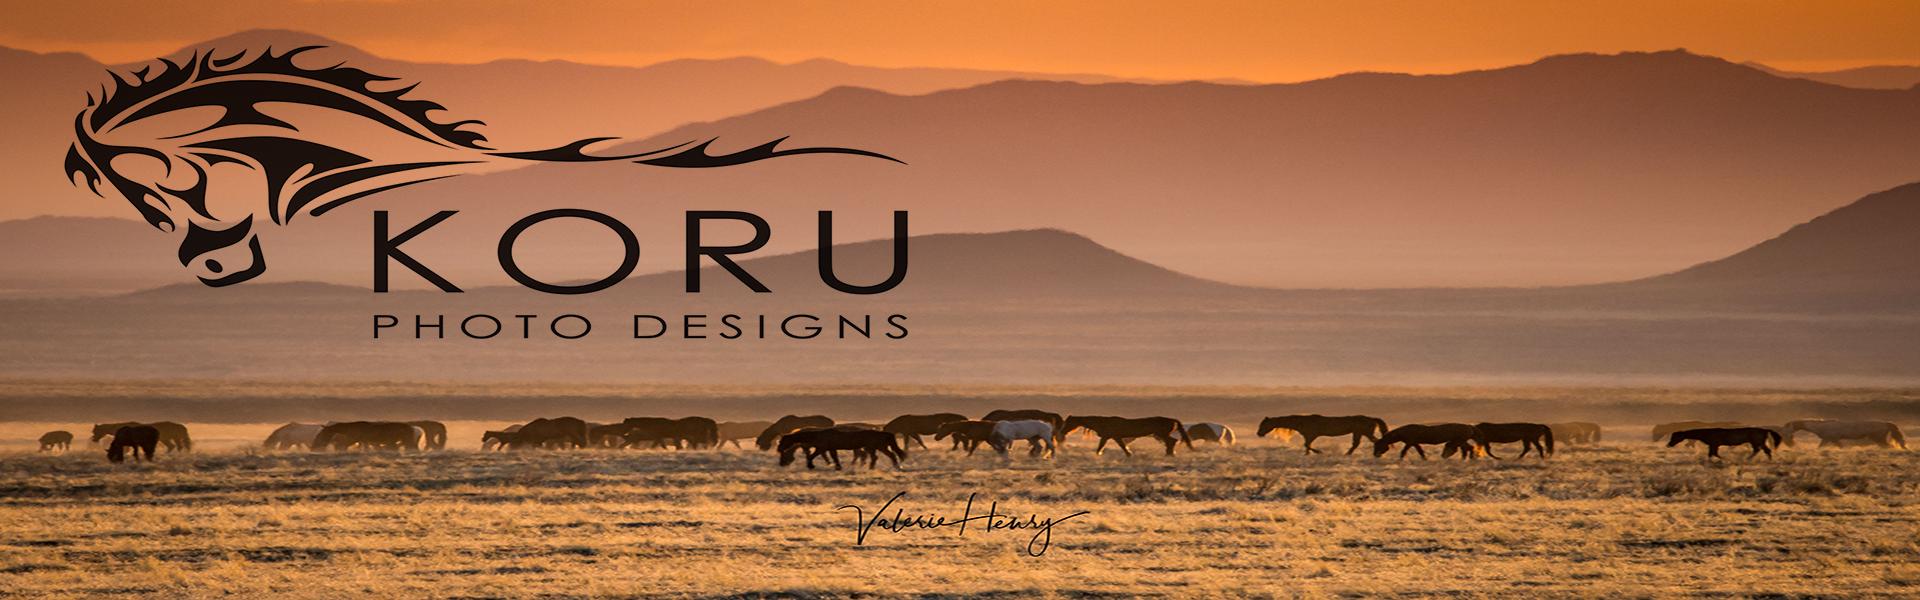 Koru Photo Designs